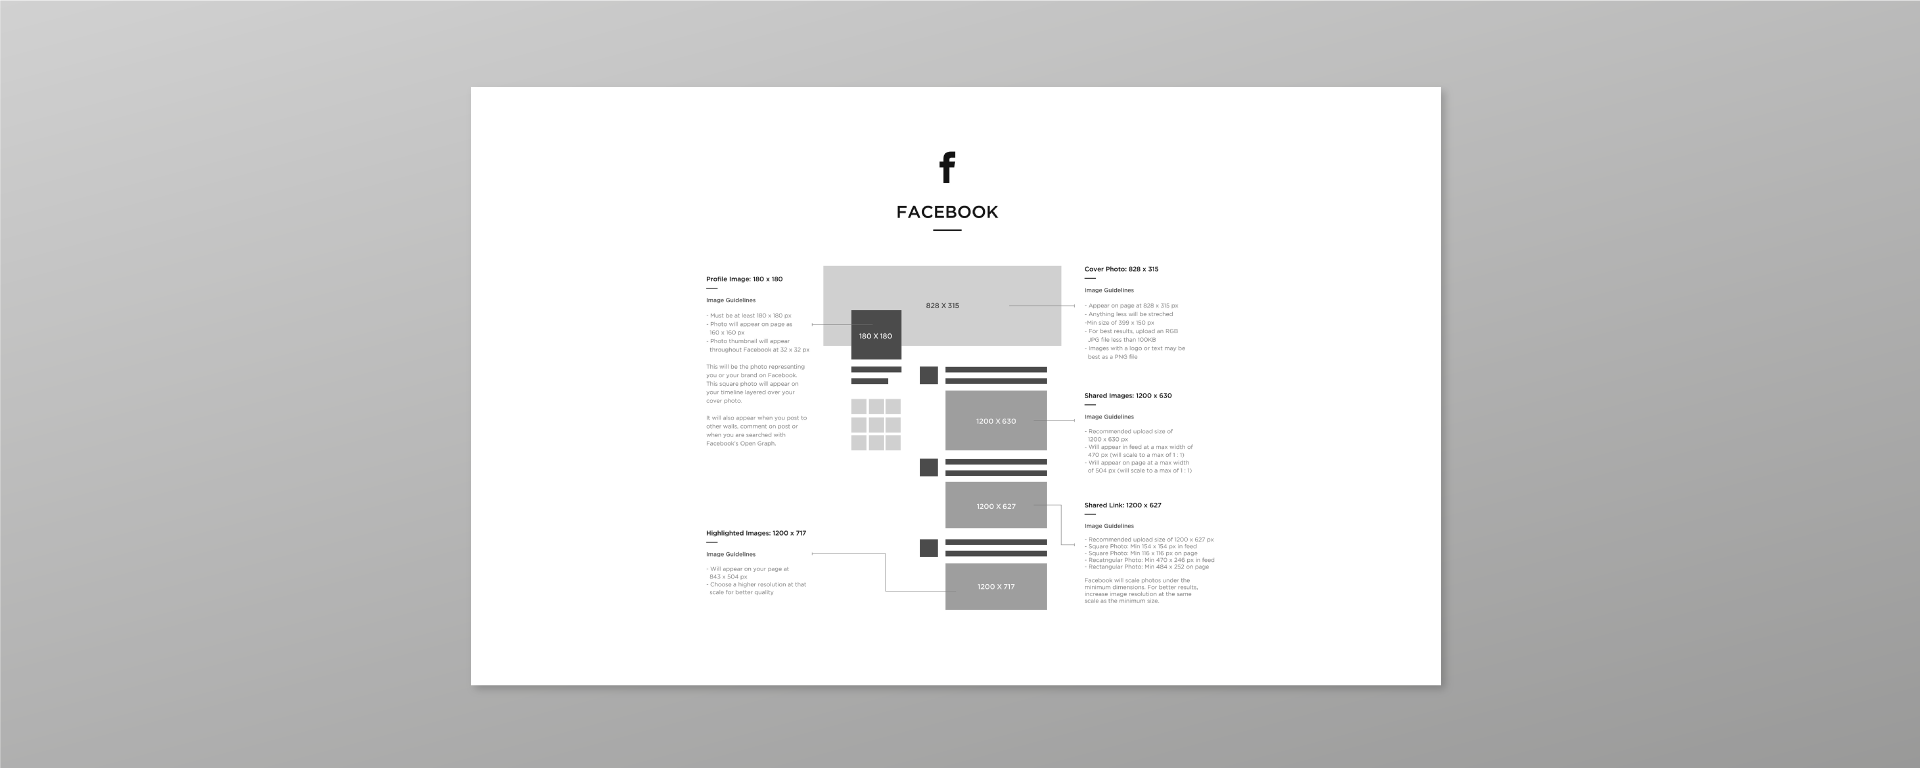 Nilead design management facebook guidelines